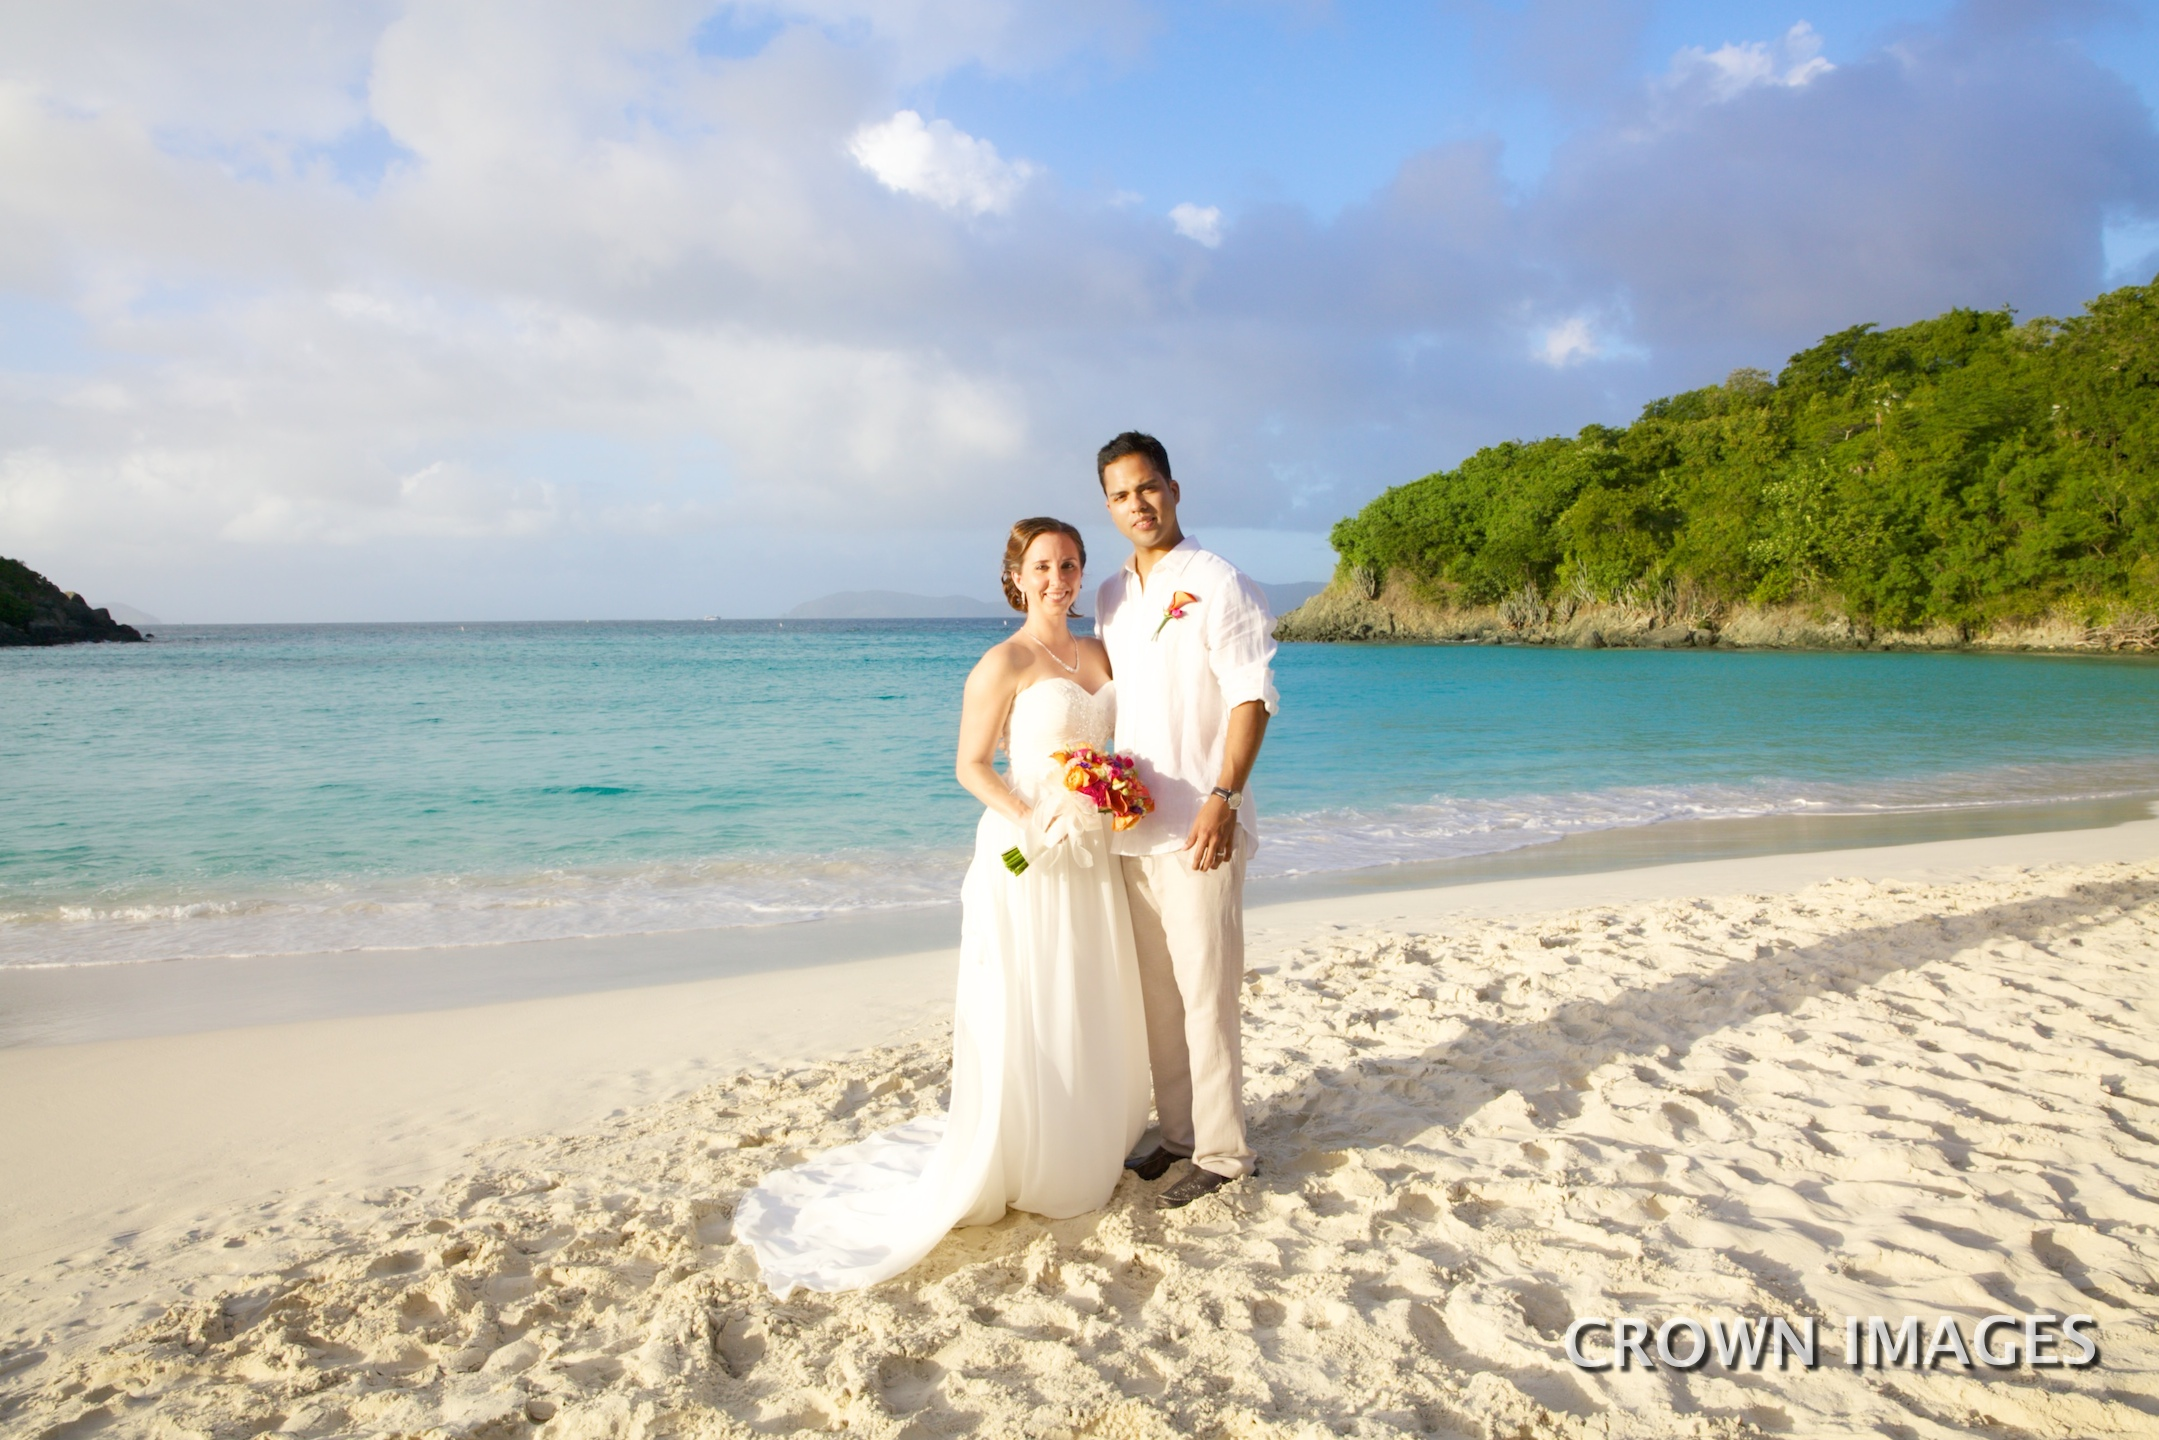 st john wedding on trunk beach IMG_0496.jpg